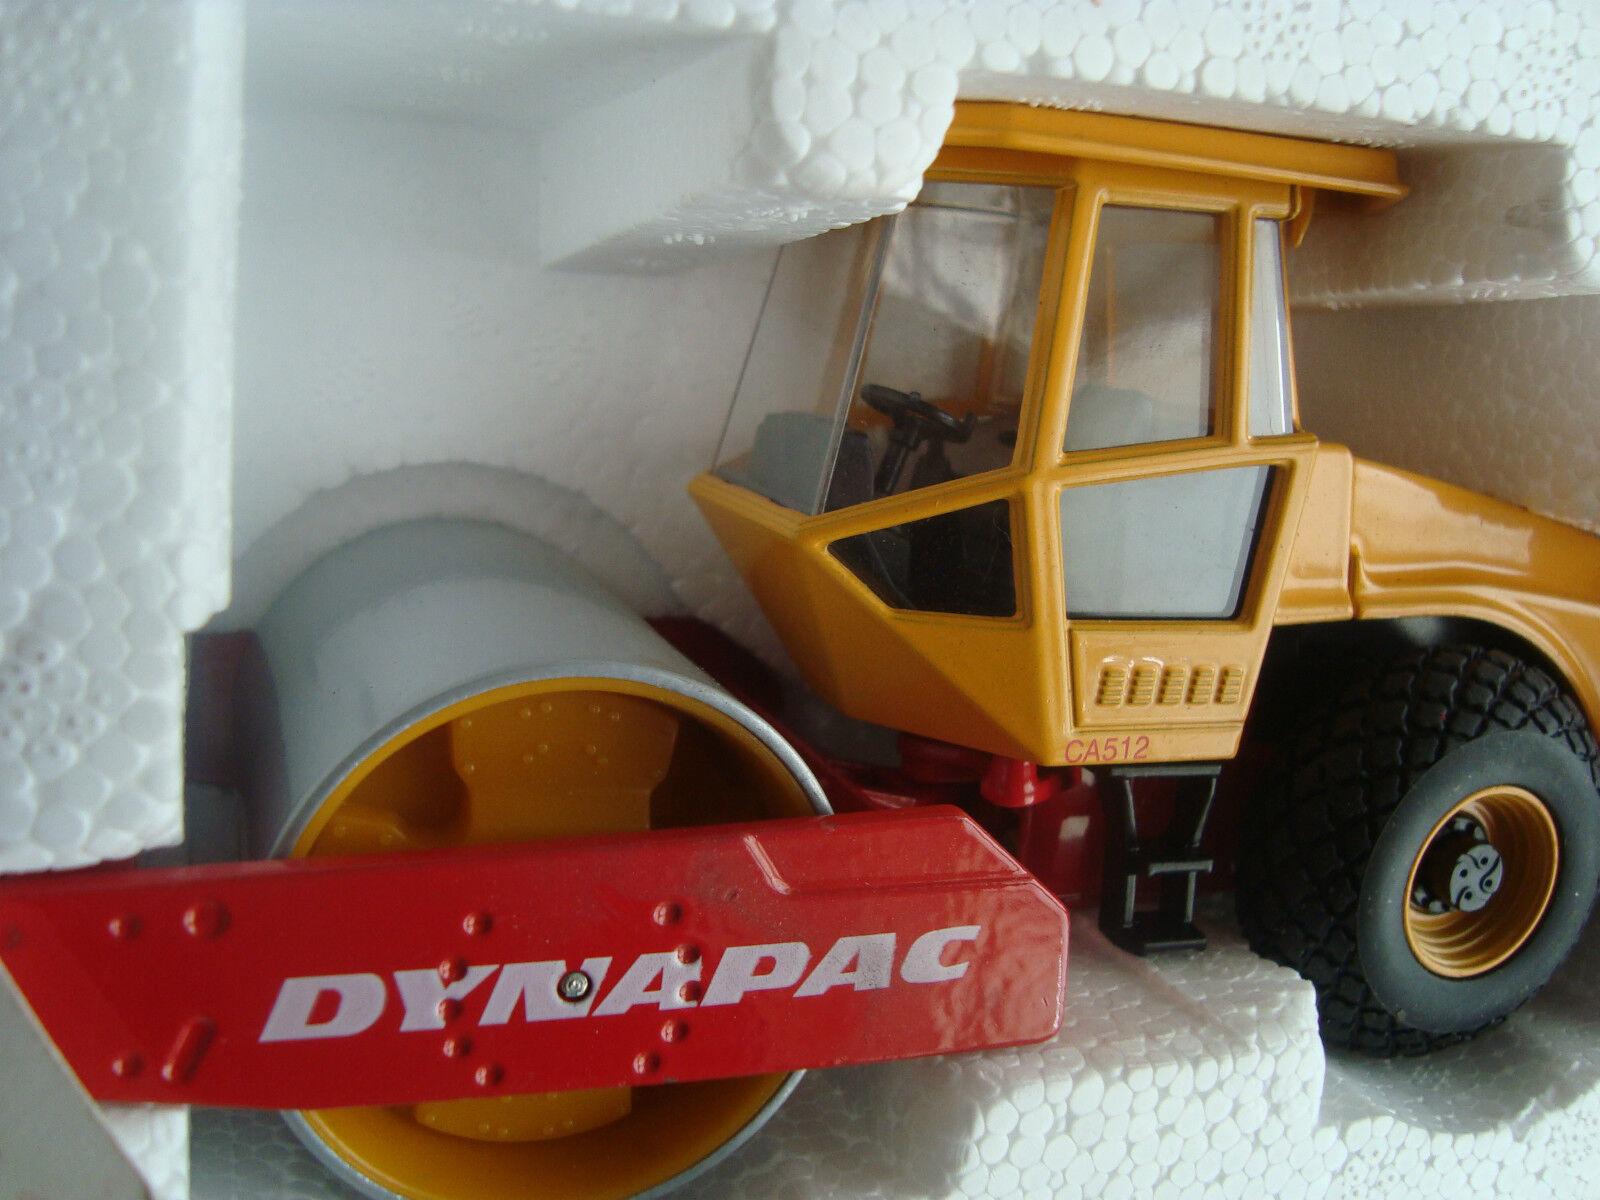 03.09.16.1 Joal Dynapac vibratory roller CA 512 1//35